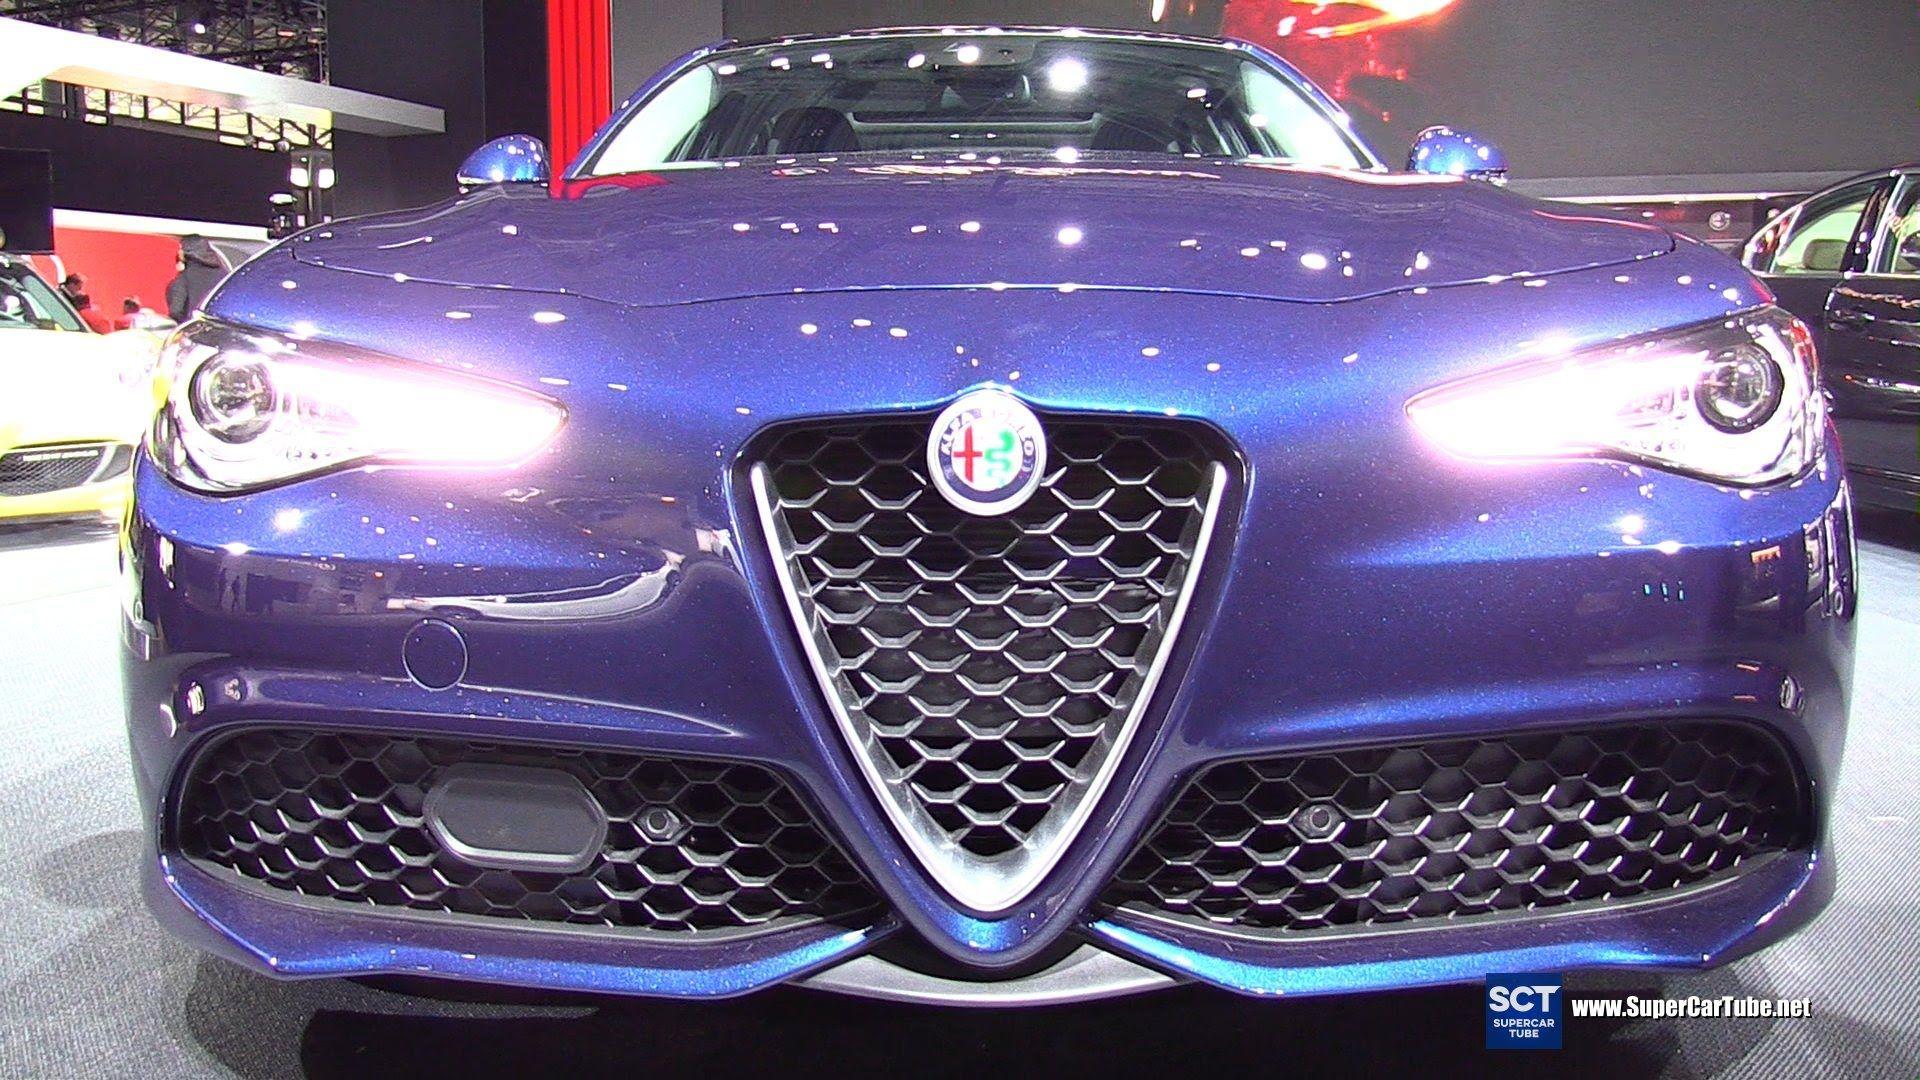 2017 Alfa Romeo Giulia Turbo Q4 Exterior And Interior Walkaround 2016 New York Auto Show Alfa Romeo Giulia Europe Car Turbo